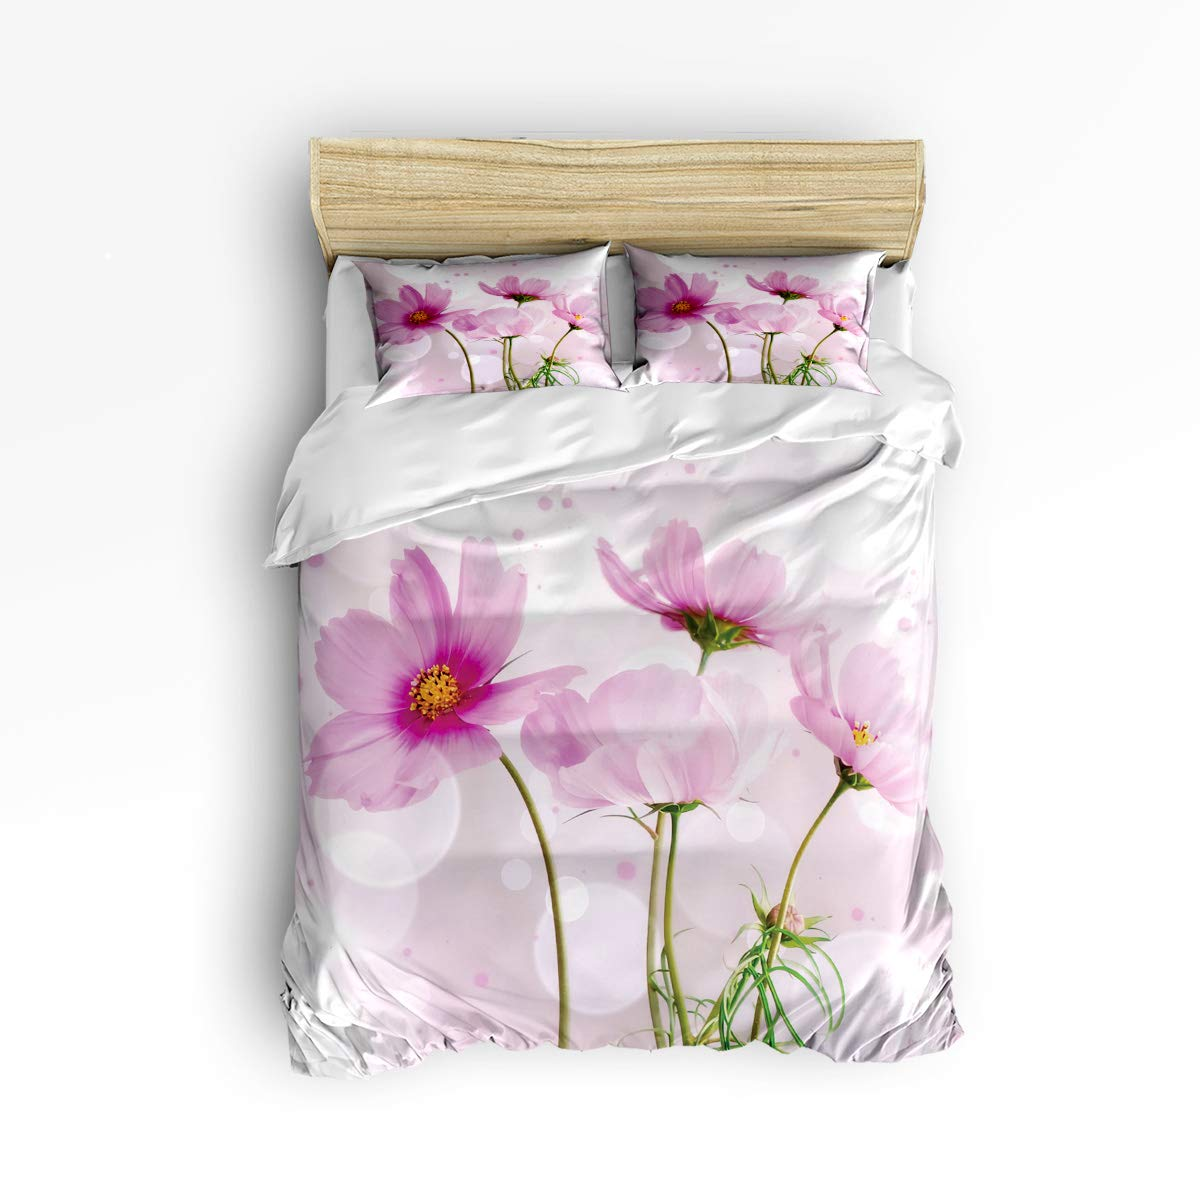 EZON-CH かわいい布団カバー3点セット 子供 男の子 女の子 レトロ 木製 ガニン パターン 高級寝具セット 掛け布団カバー 1 枚と枕カバー2枚 フルサイズ 20190117WHLSJSEZONCSLEO00831SJSBEZN B07MVX5XJ6 Flower39ezn7578 フルサイズ